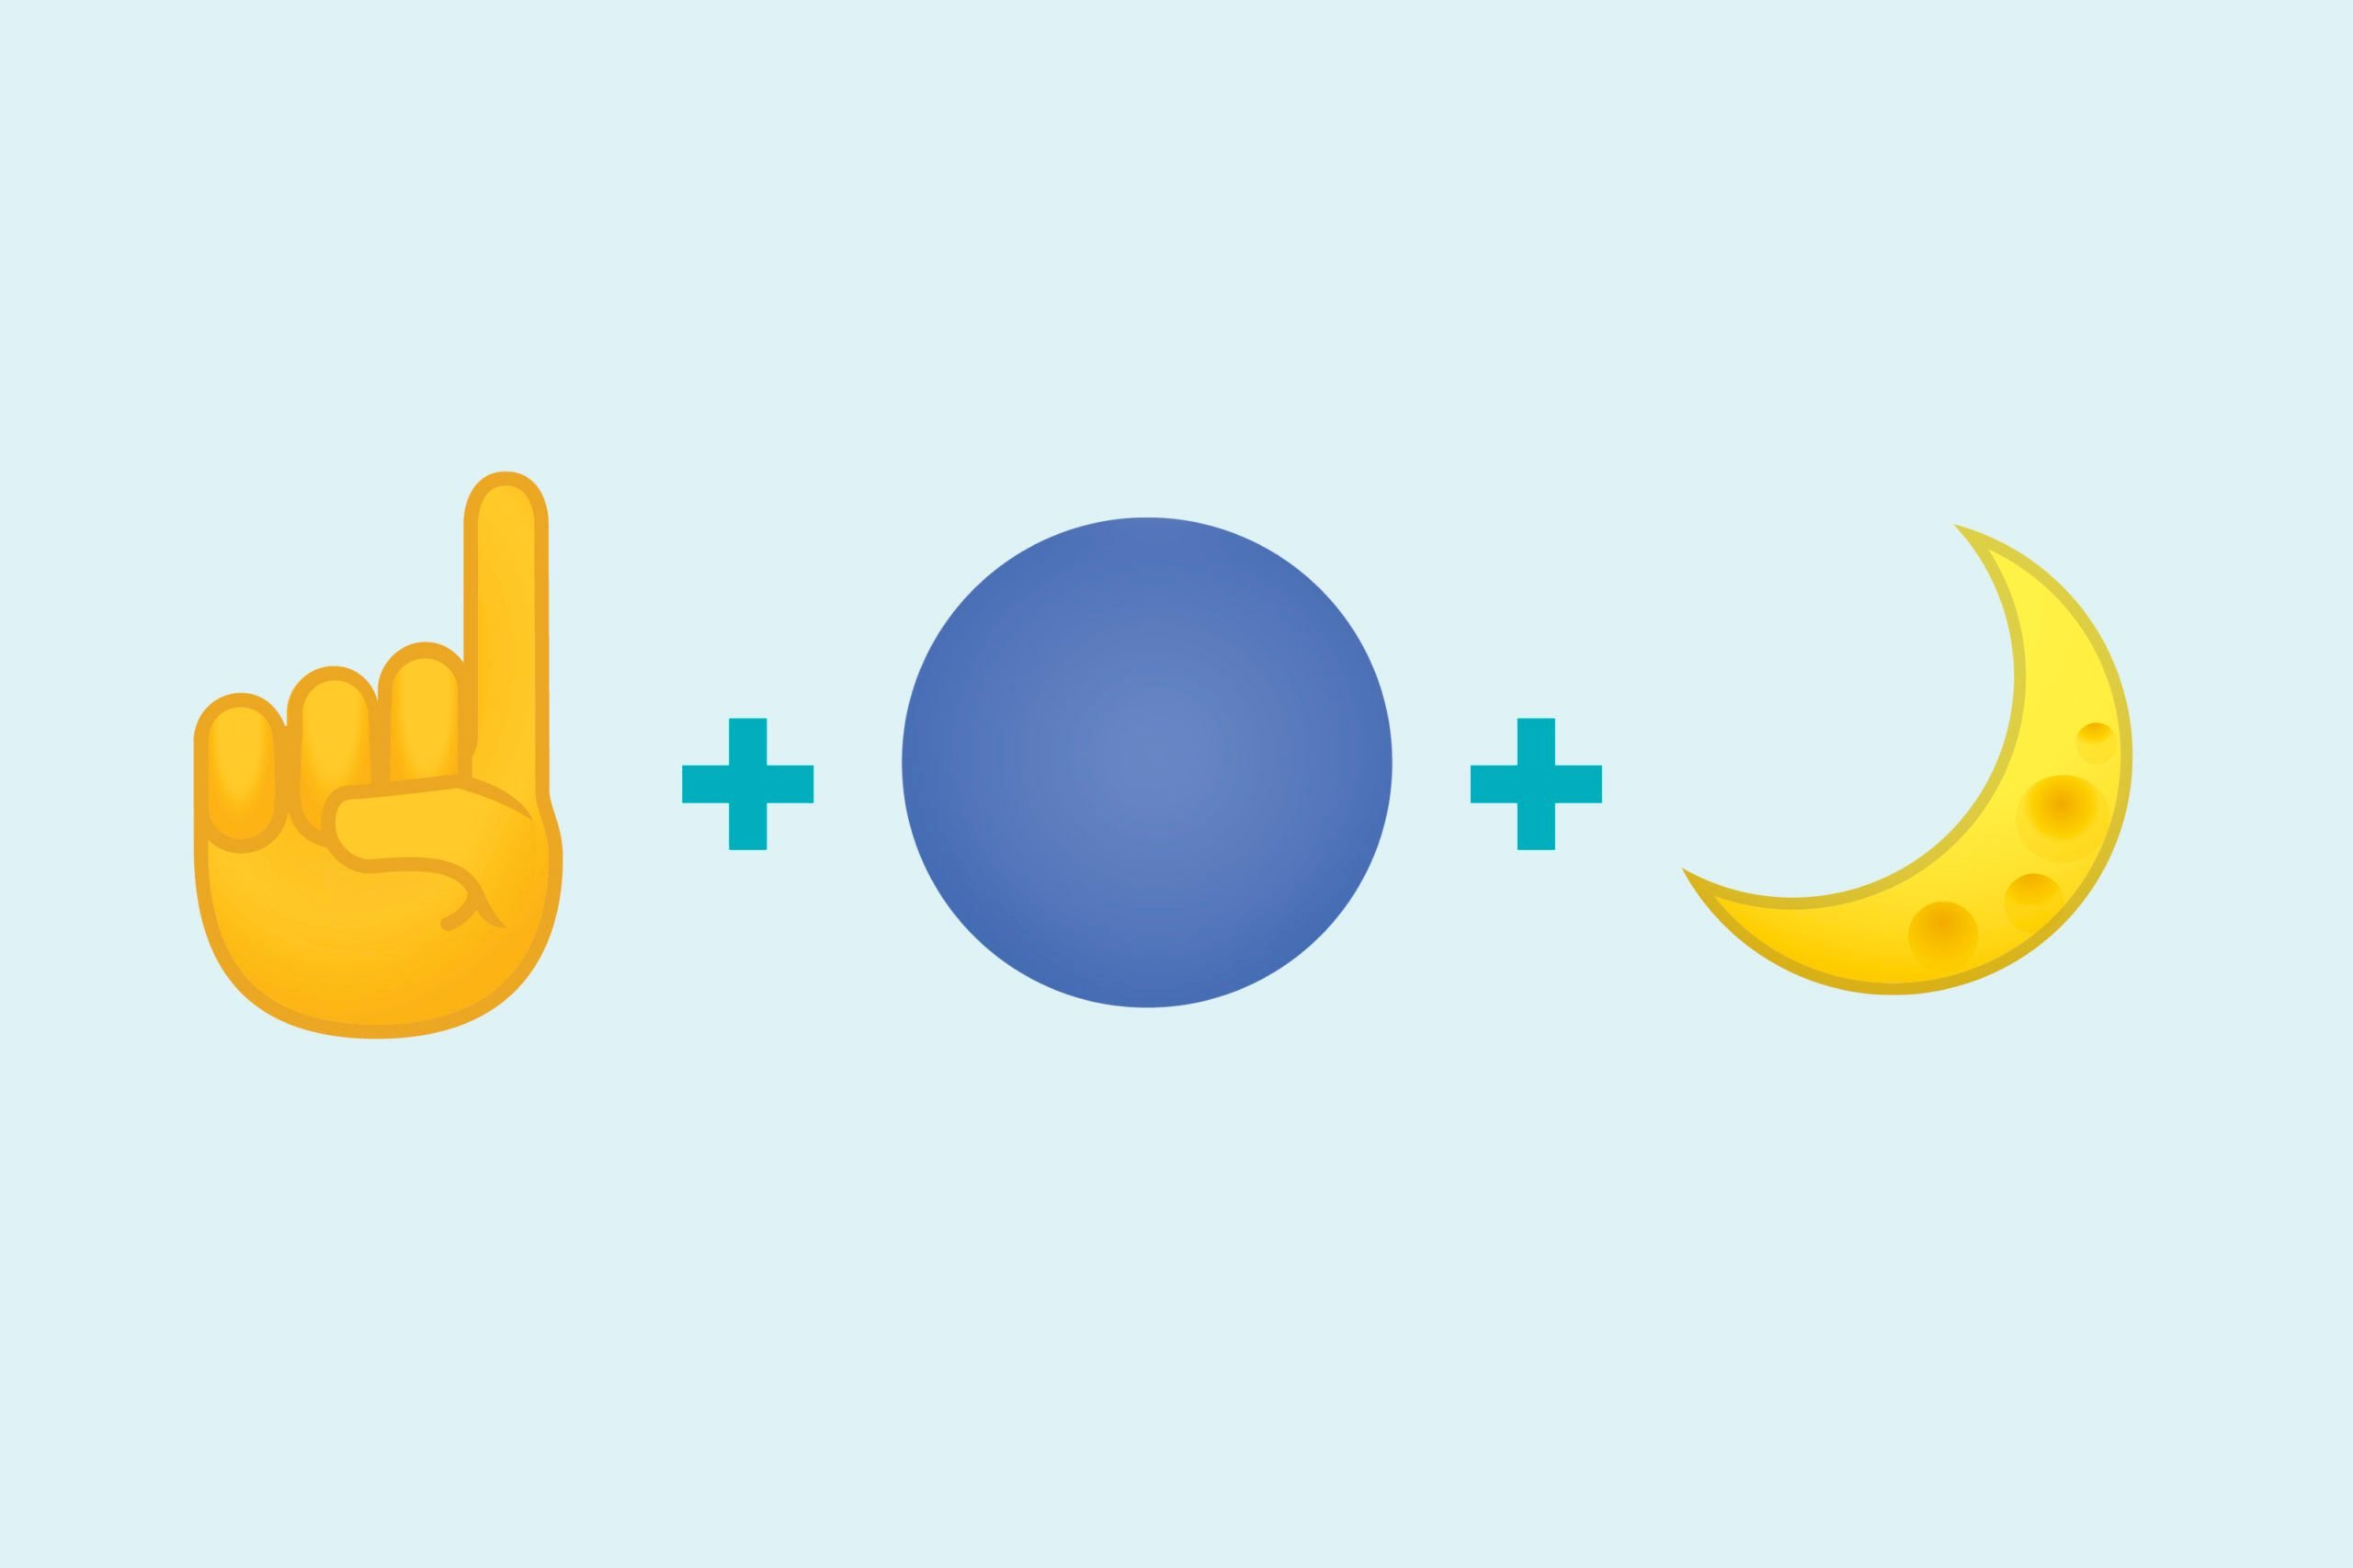 Finger holding up number one emoji + blue circle emoji + moon emoji